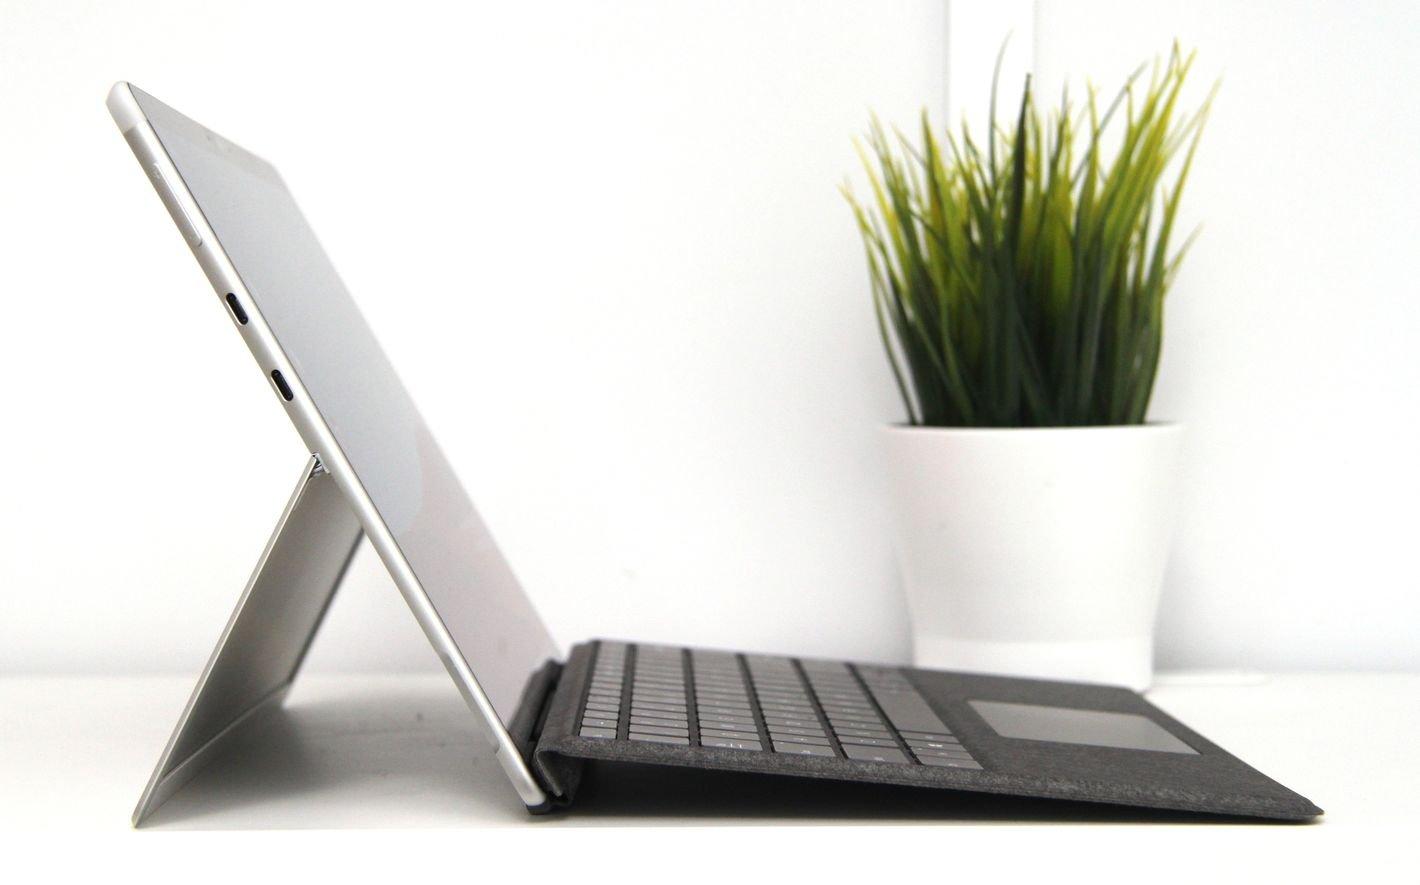 Microsoft Surface Pro X klawiatura pod kątem